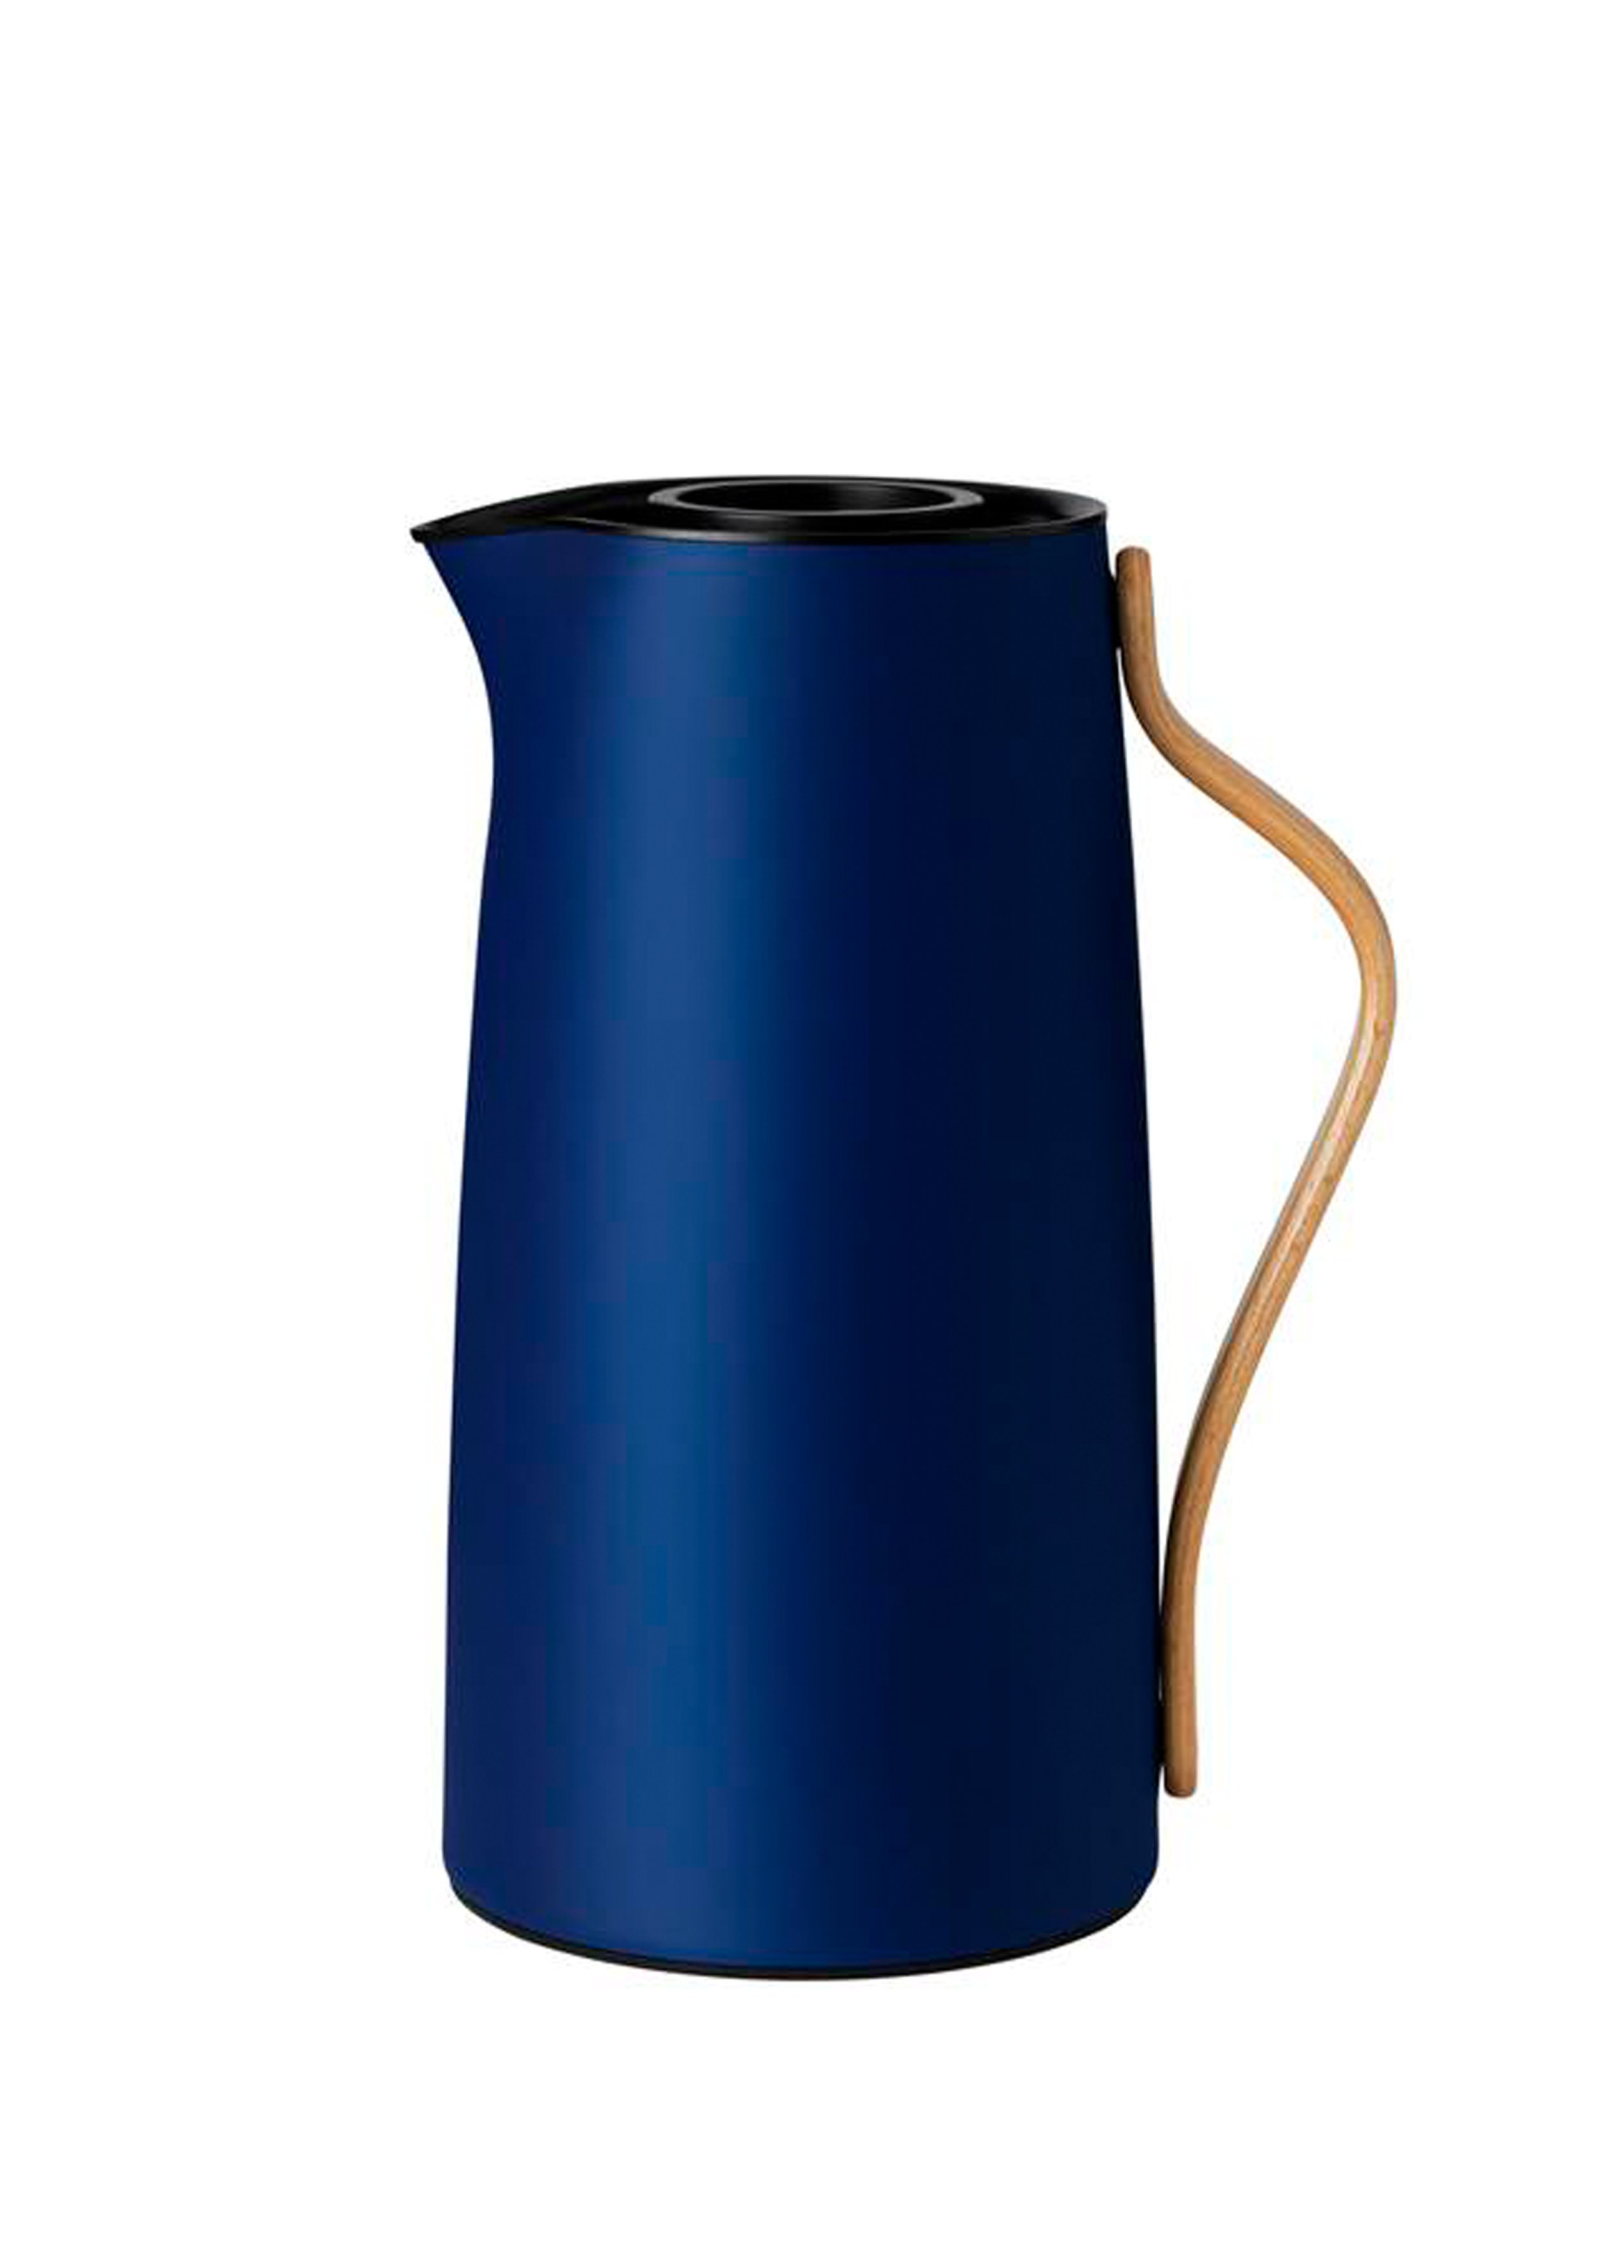 Stelton - Emma Coffee Thermo 1,2 L - Dark Blue (x-200-7)